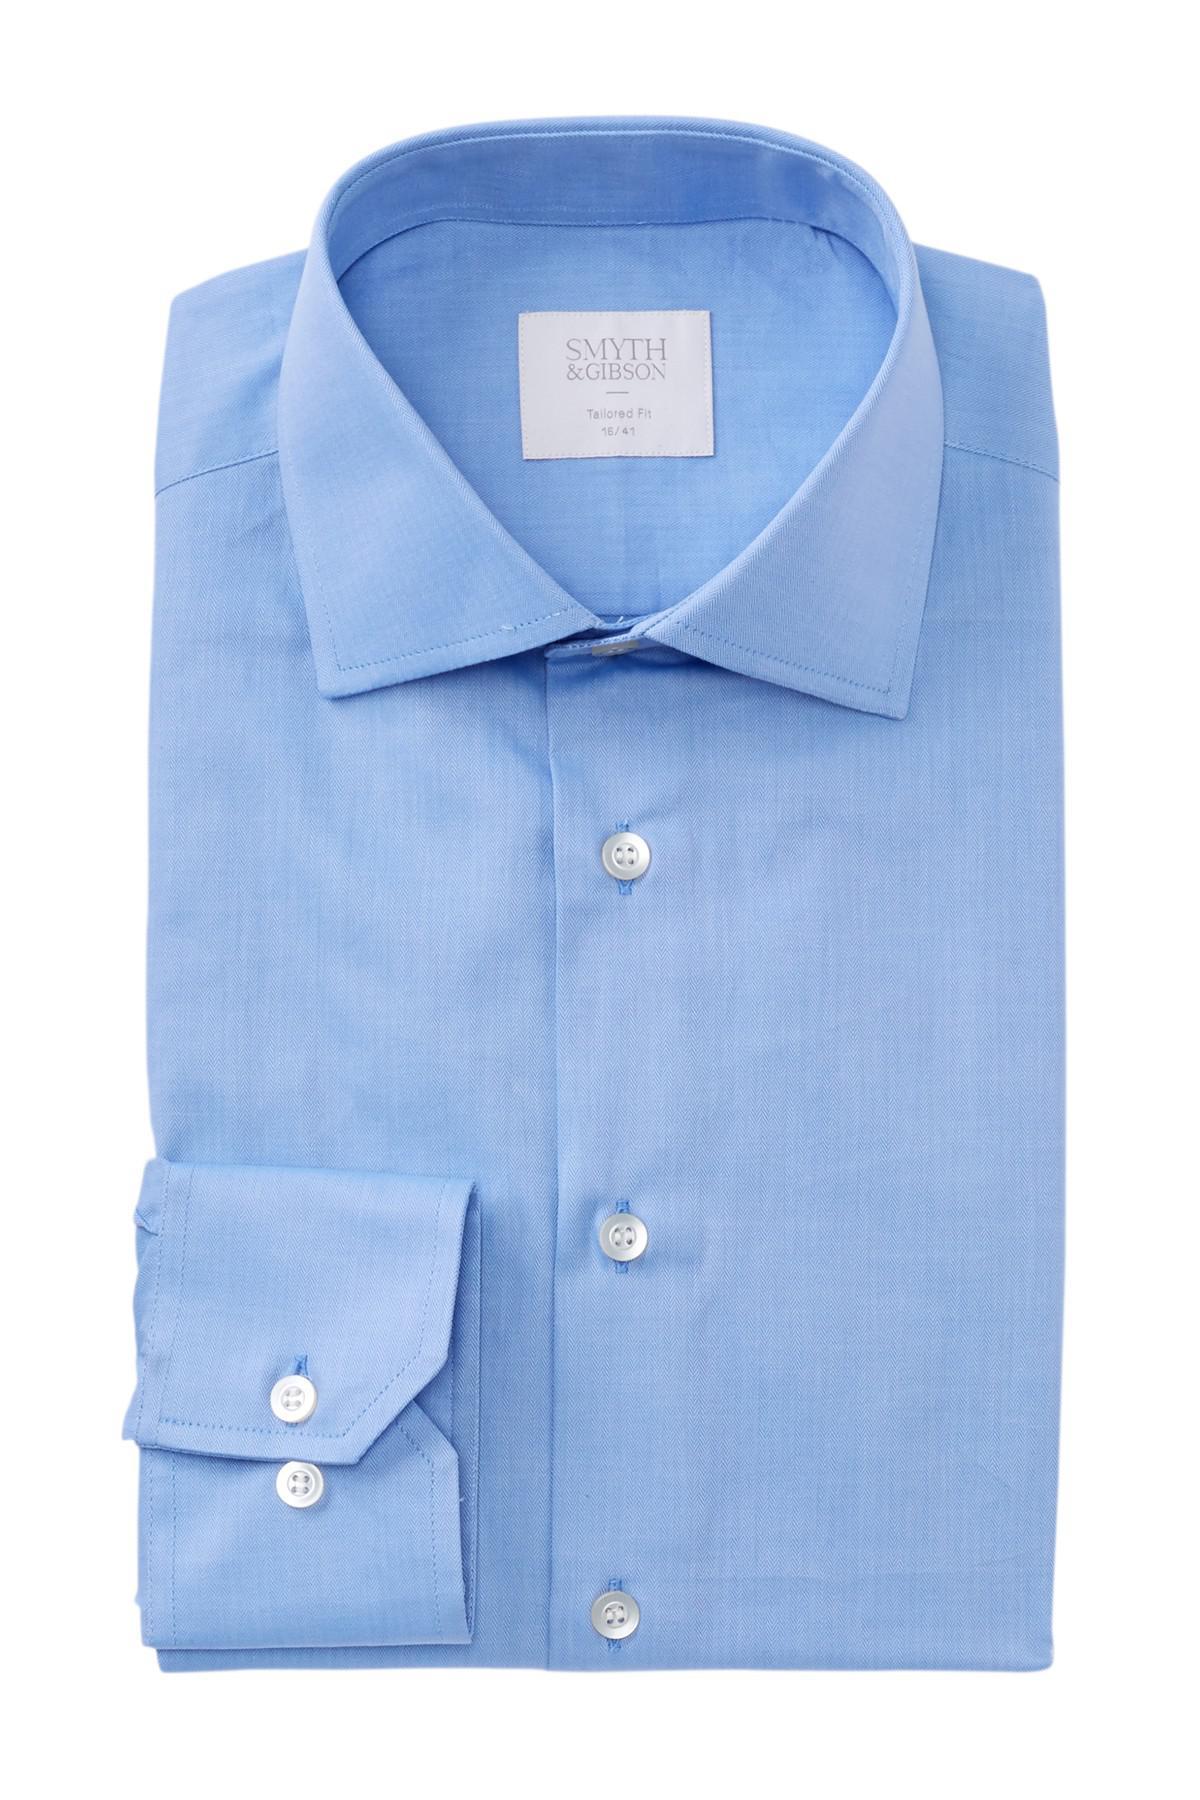 Smyth gibson micro herringbone tailored fit dress shirt for Tailored fit dress shirts